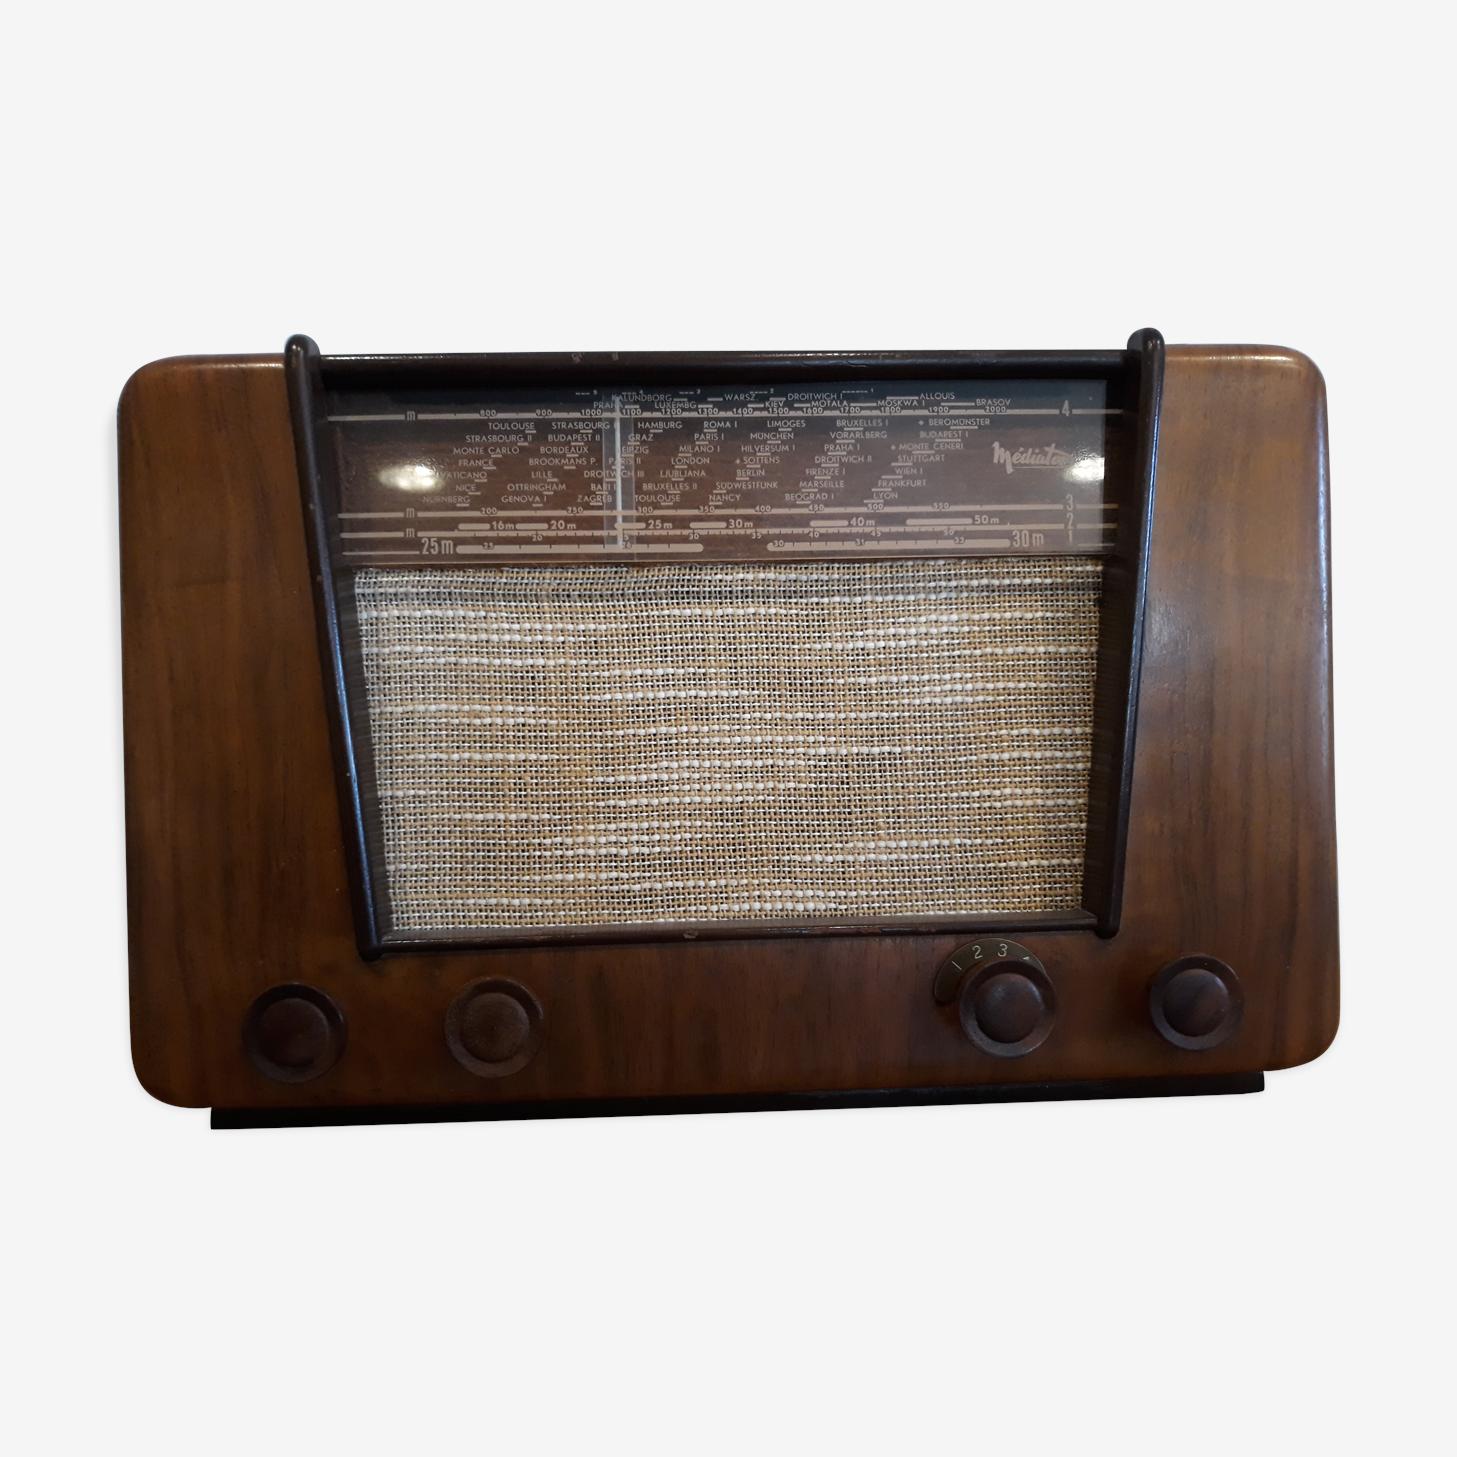 Former radio station